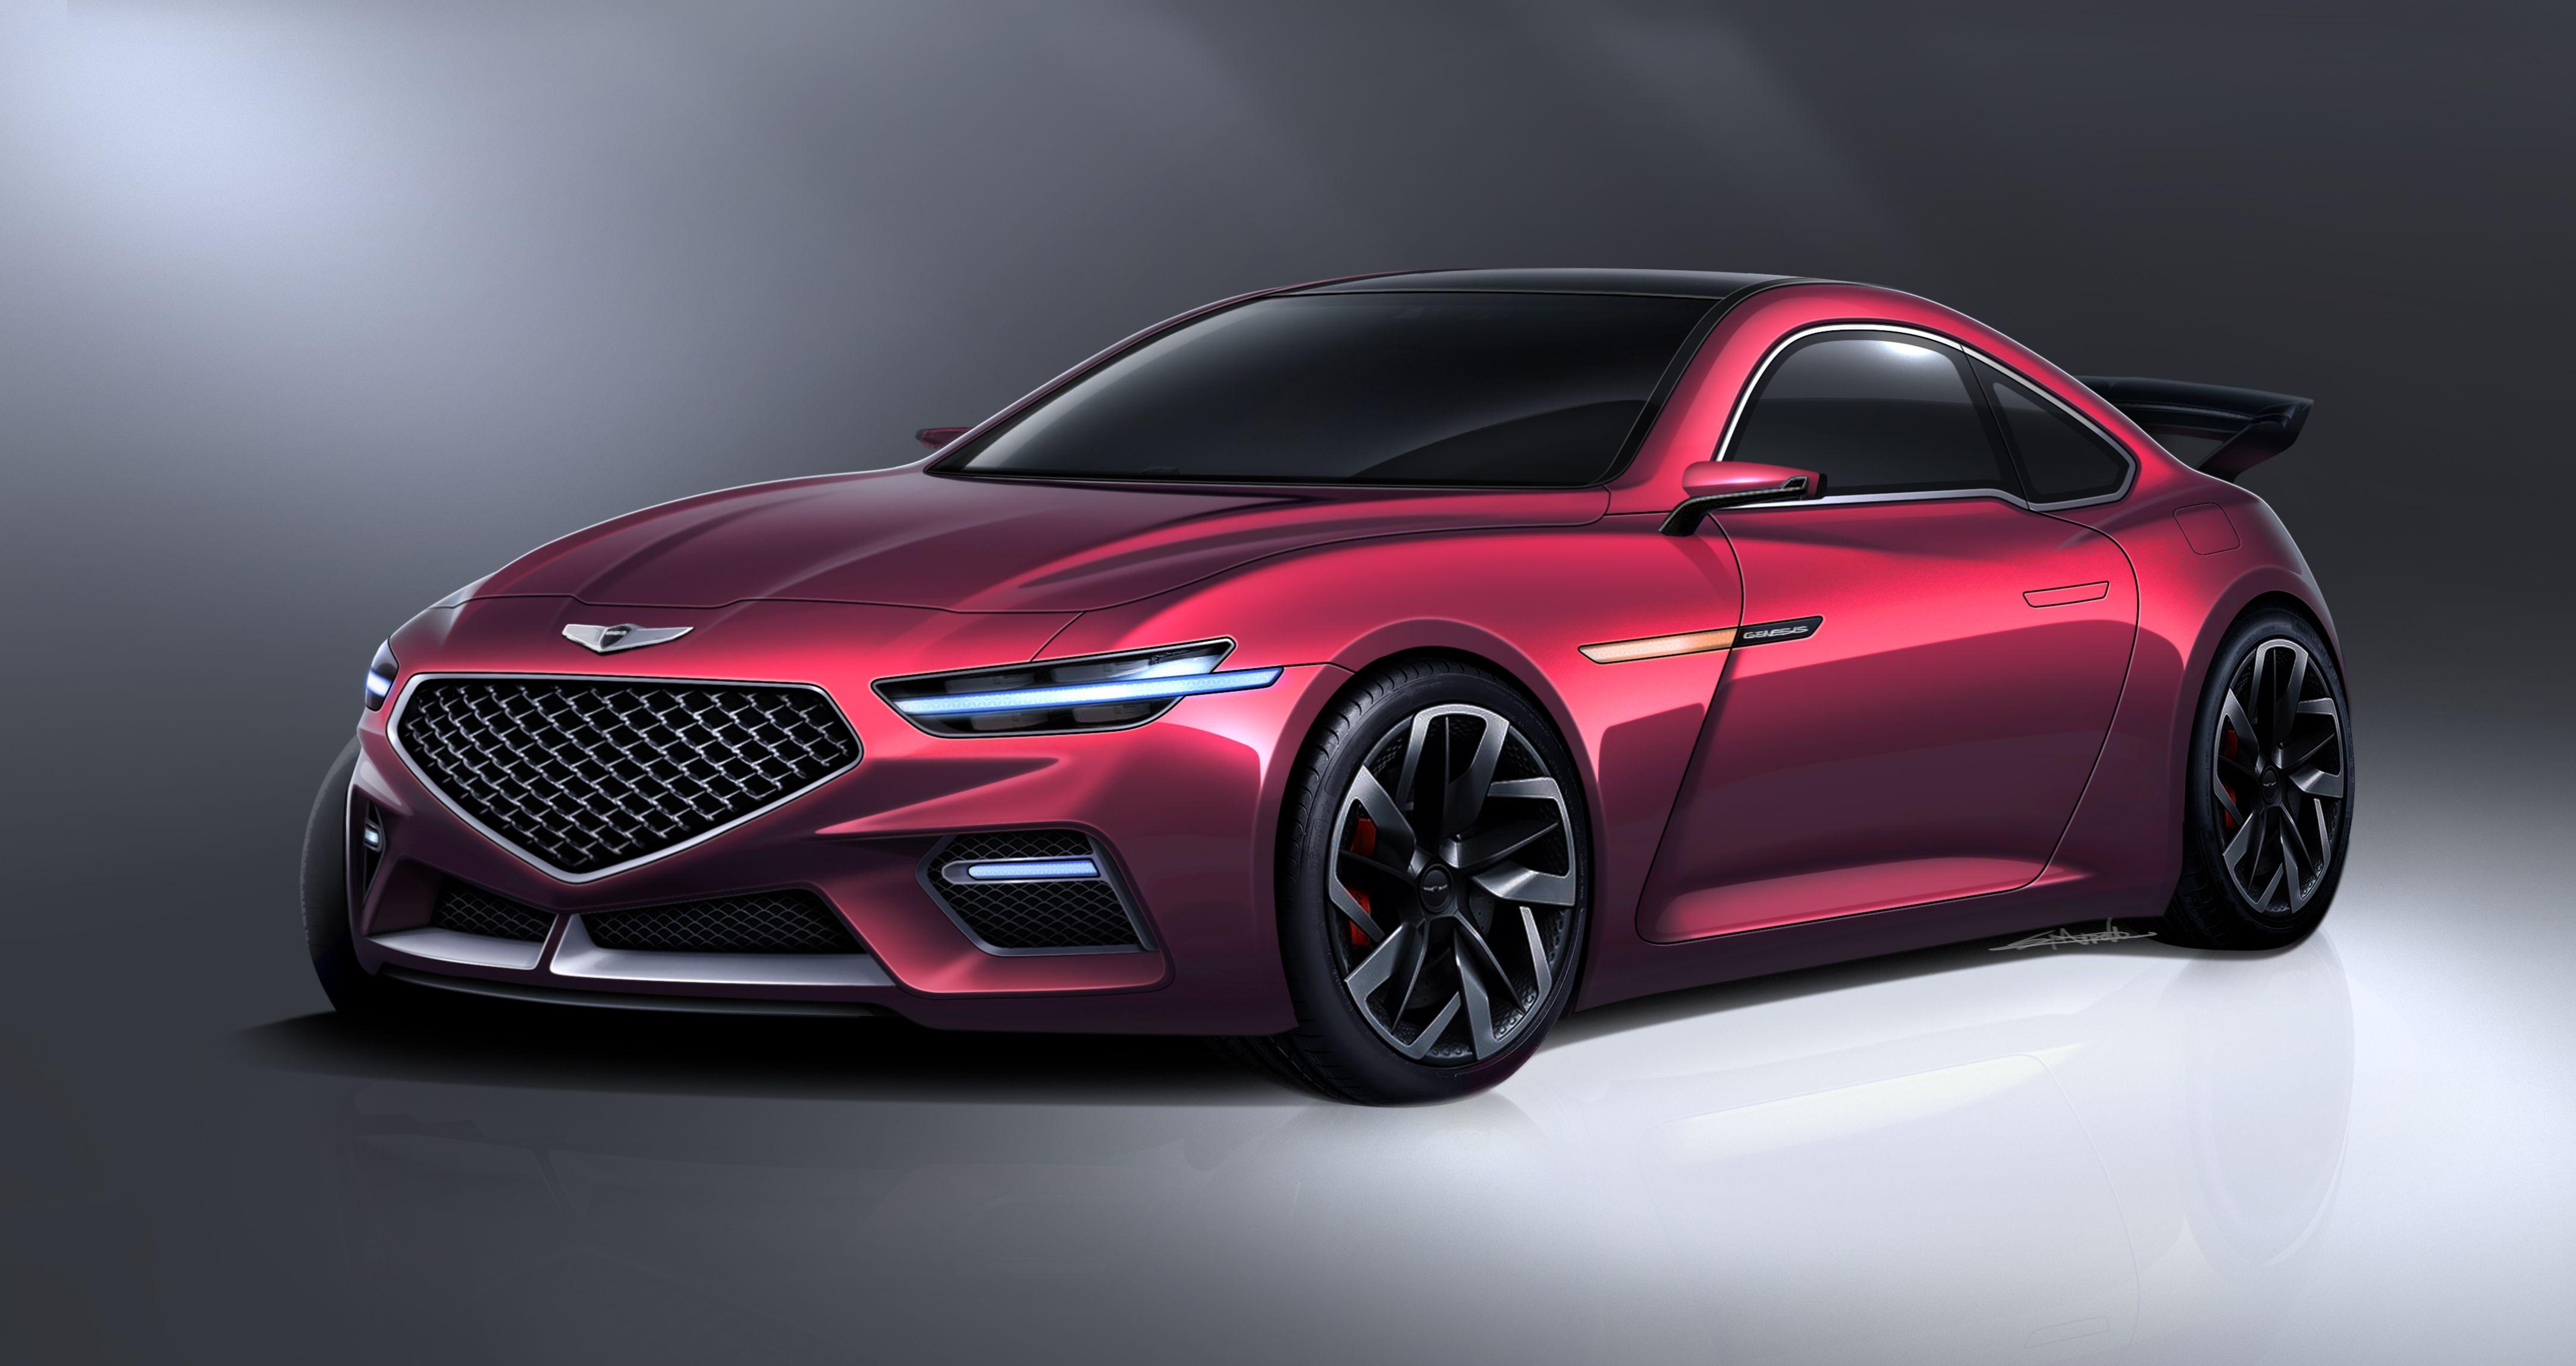 2020 genesis coupe 자동차, 디자인